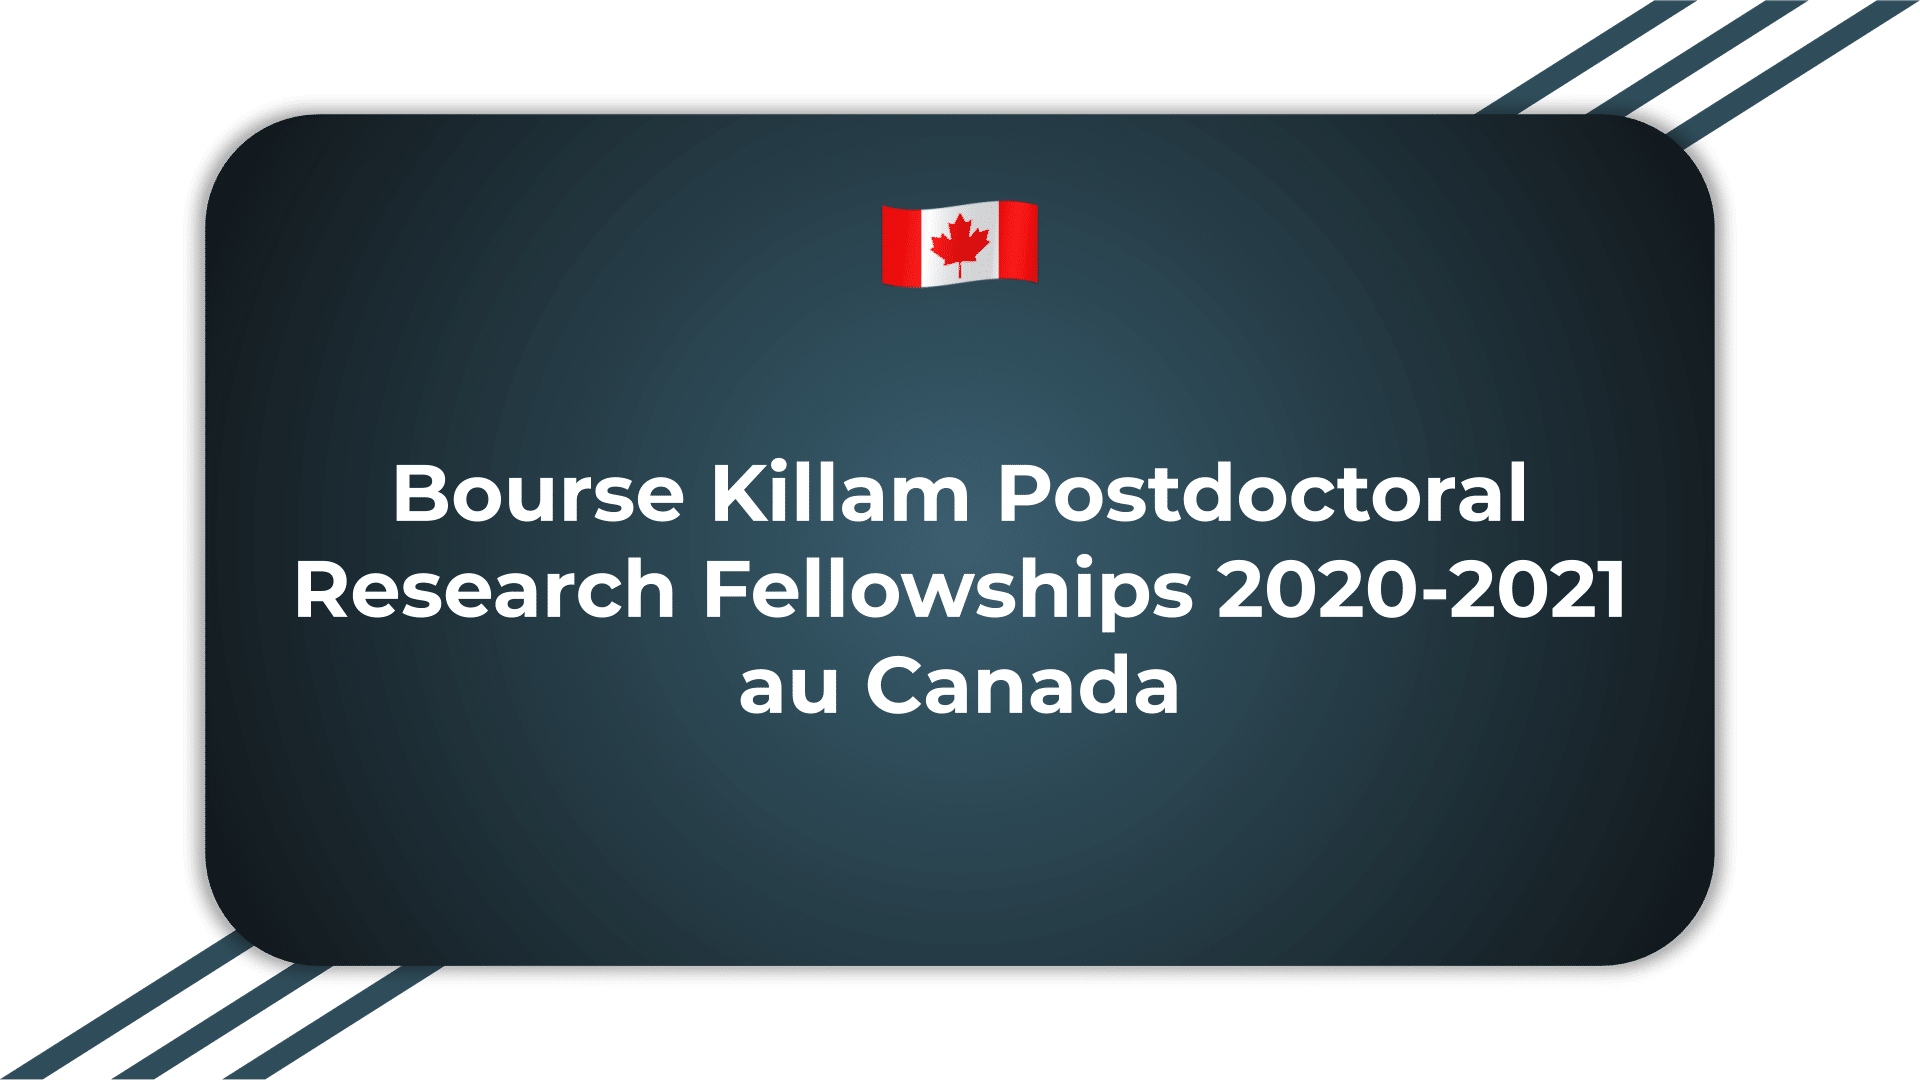 Bourse Killam Postdoctoral Research Fellowships